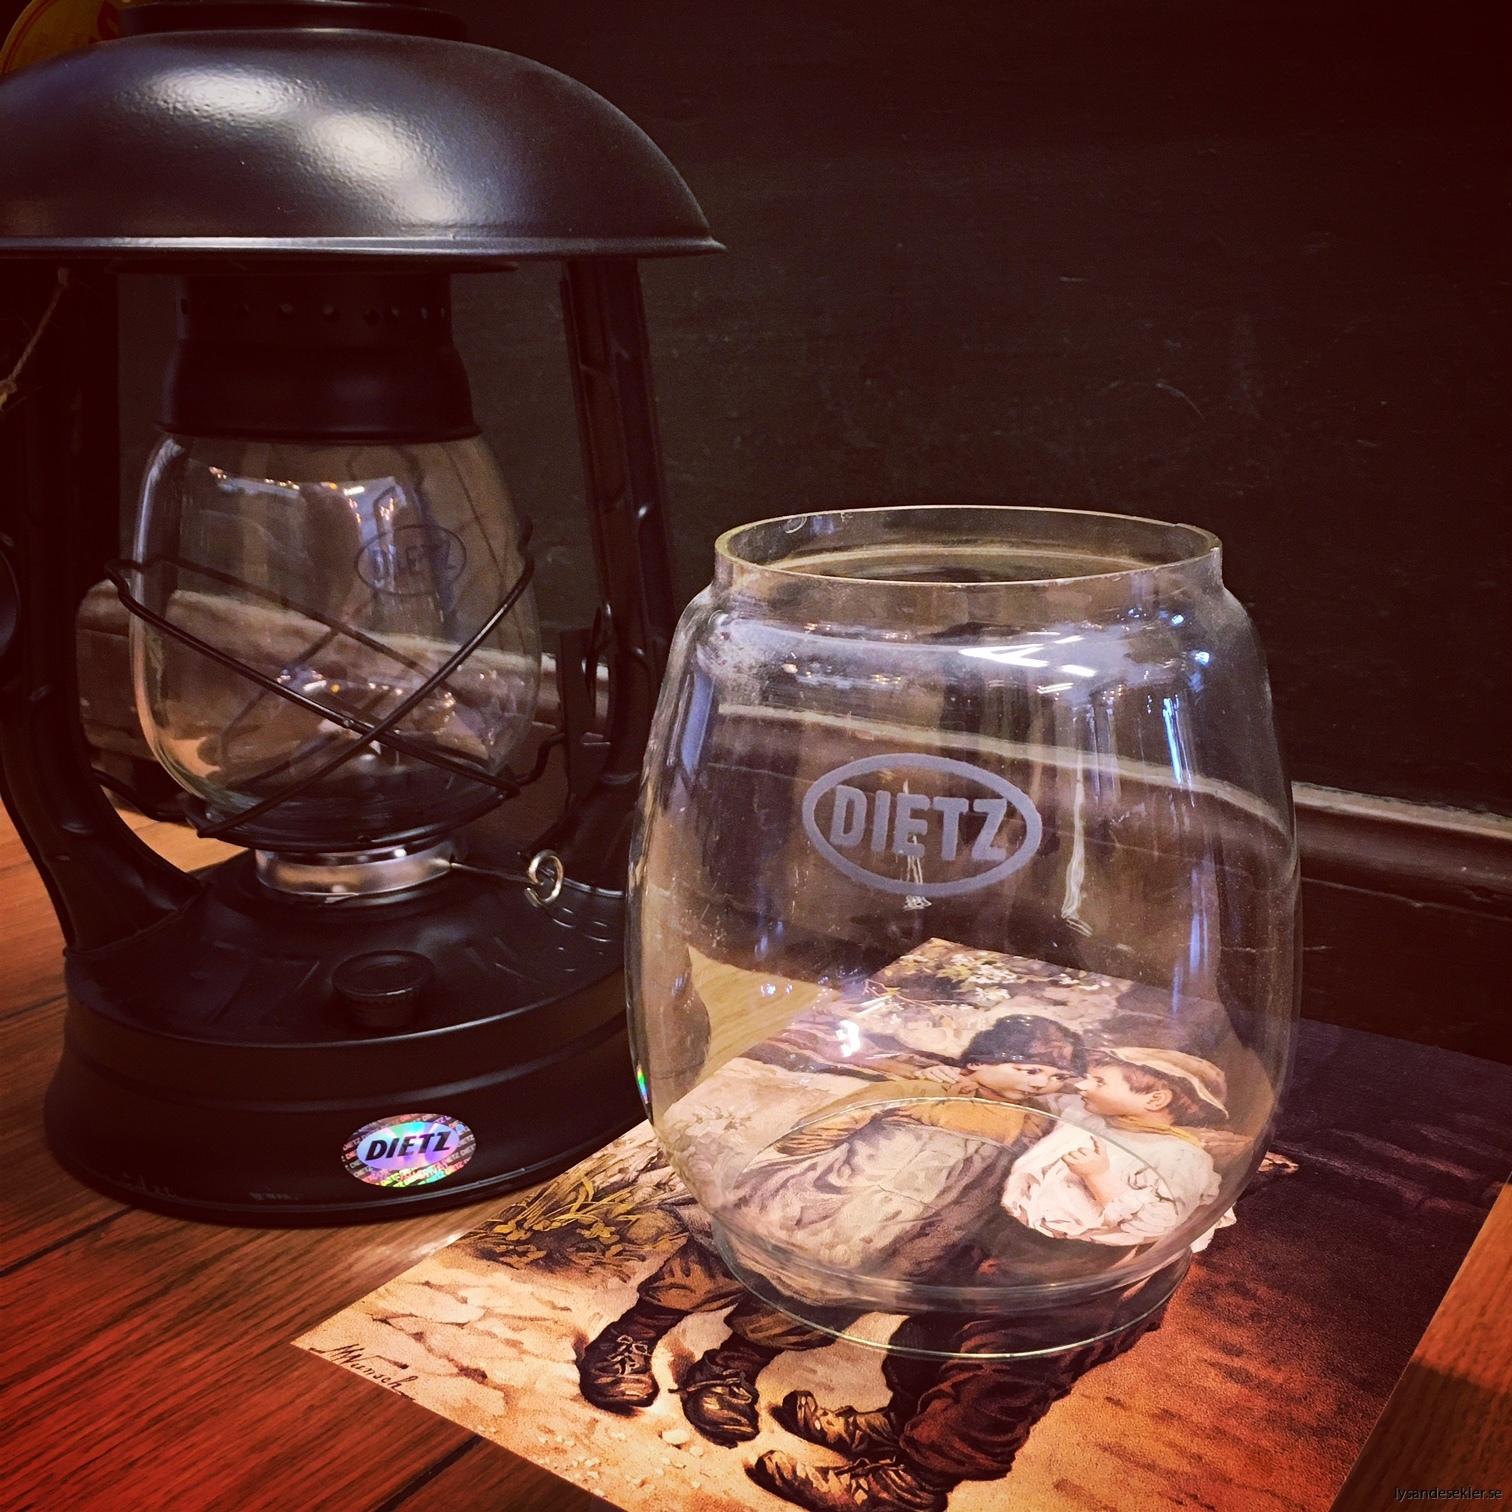 dietz extraglas reservglas glas stormlykta stallykta (1)